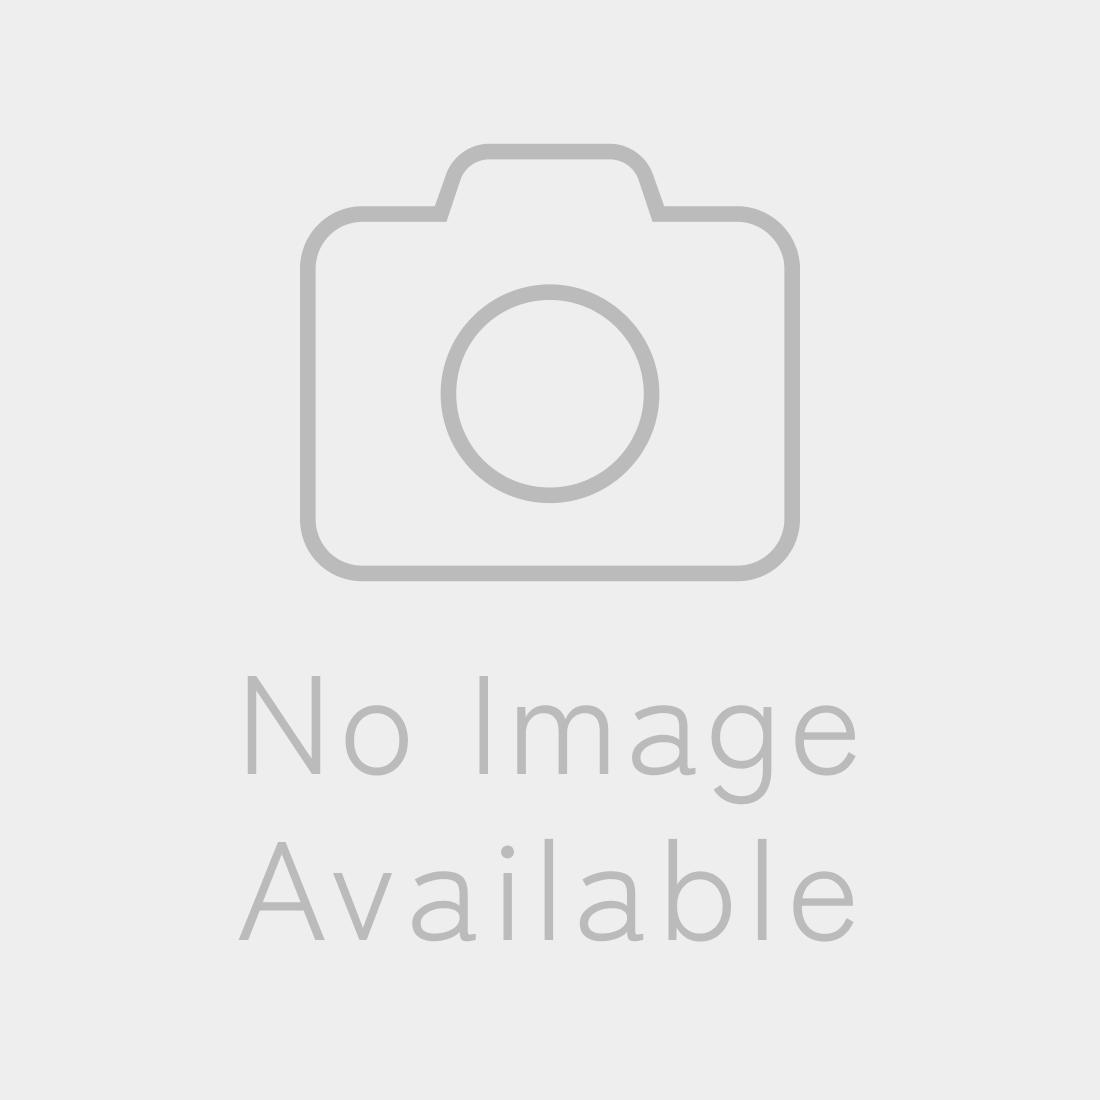 rocbpcl048_baitplate_091421